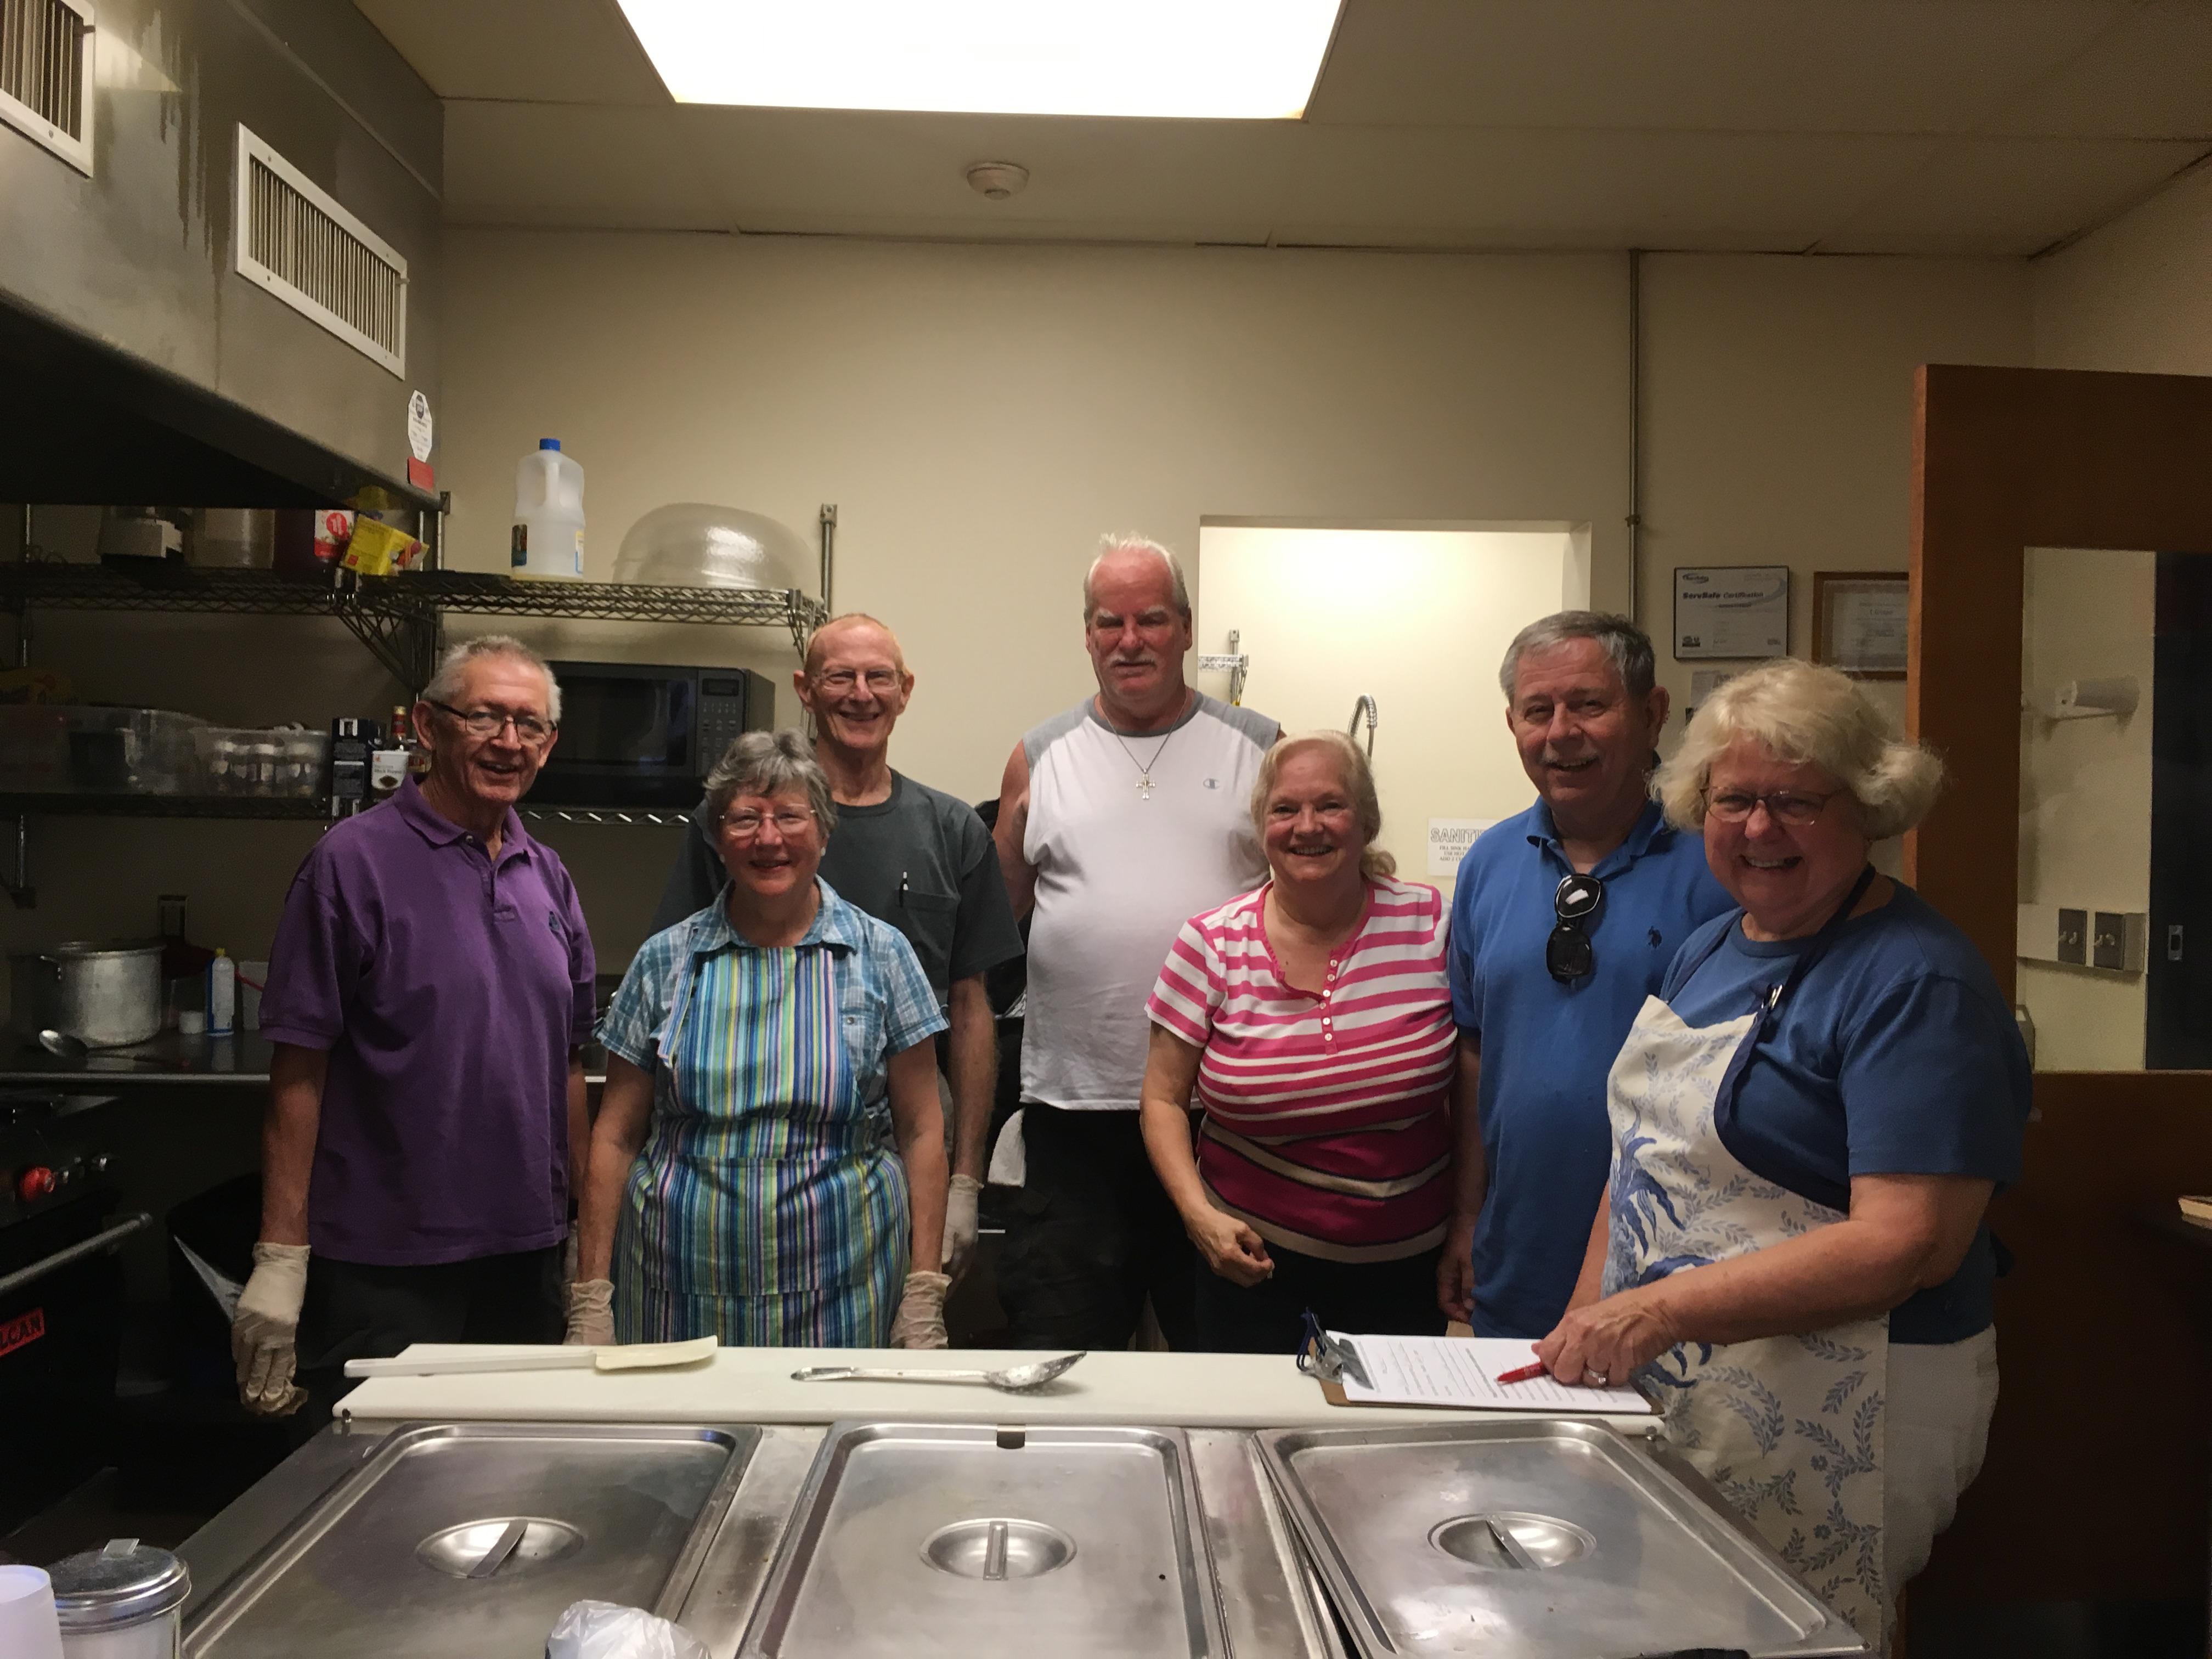 FellowshipOutreach  St Johns Evangelical Lutheran Church